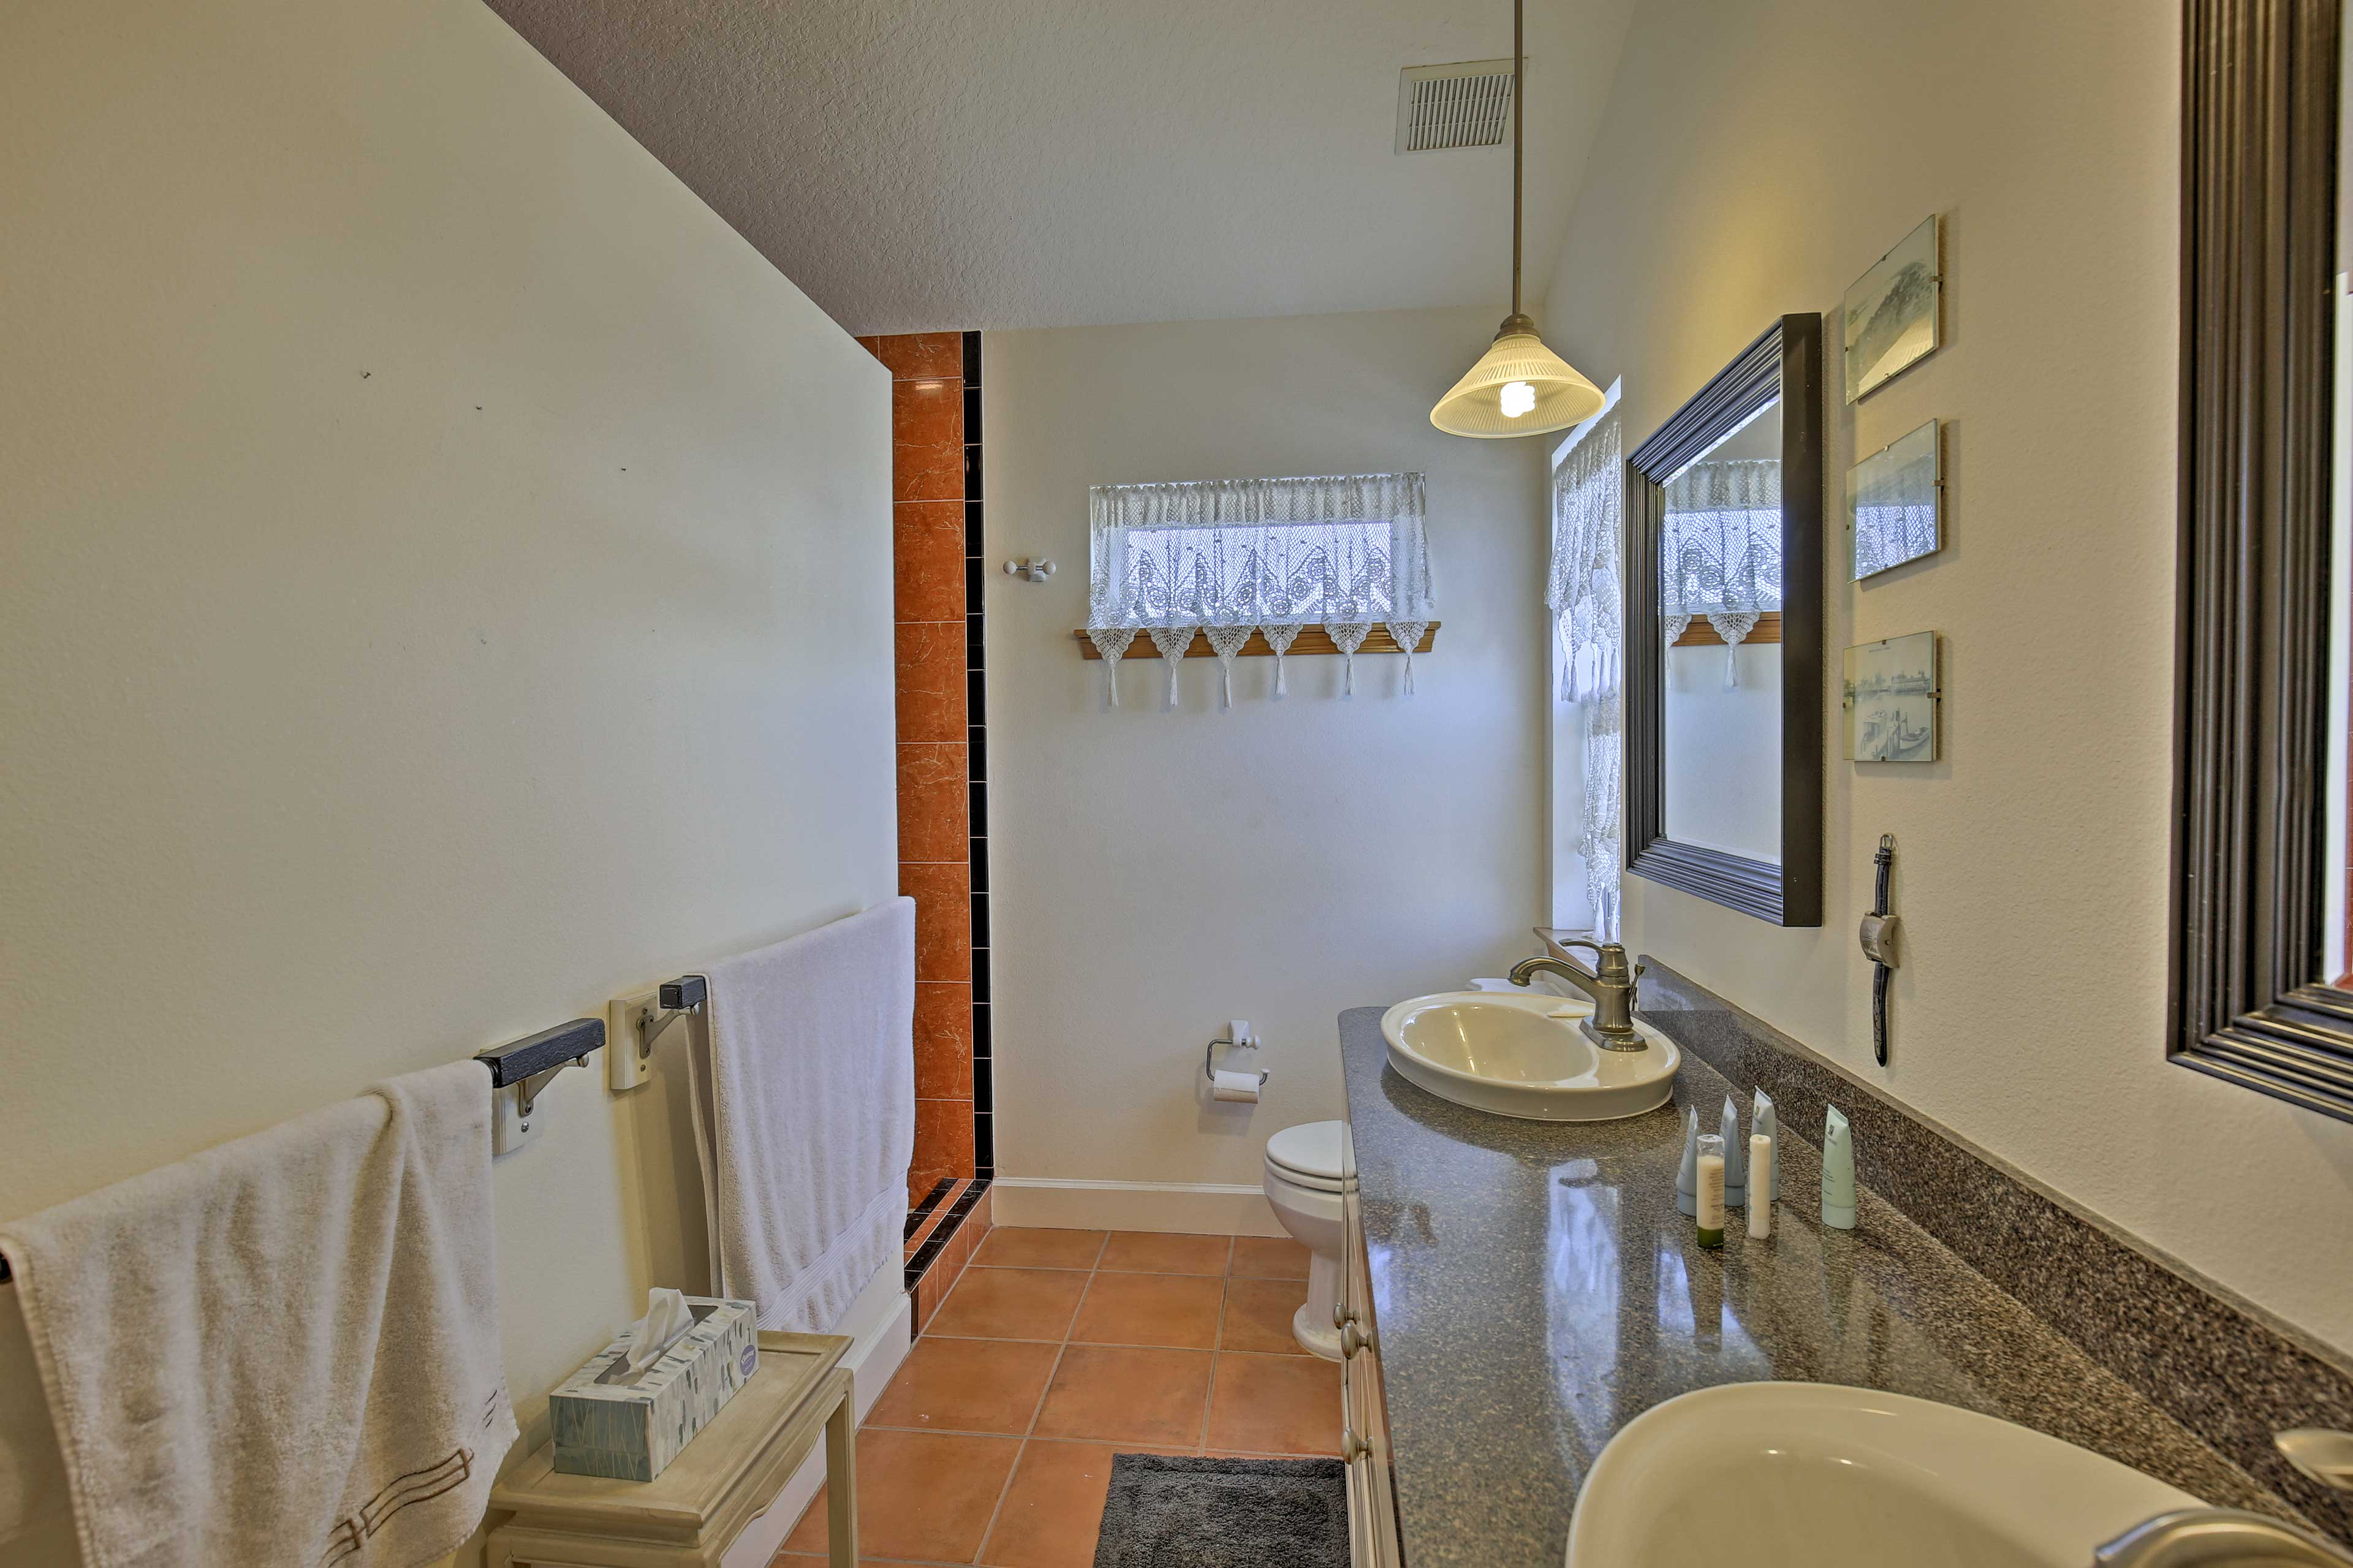 Wash up in the double vanity and walk-in shower in the master en-suite bathroom.